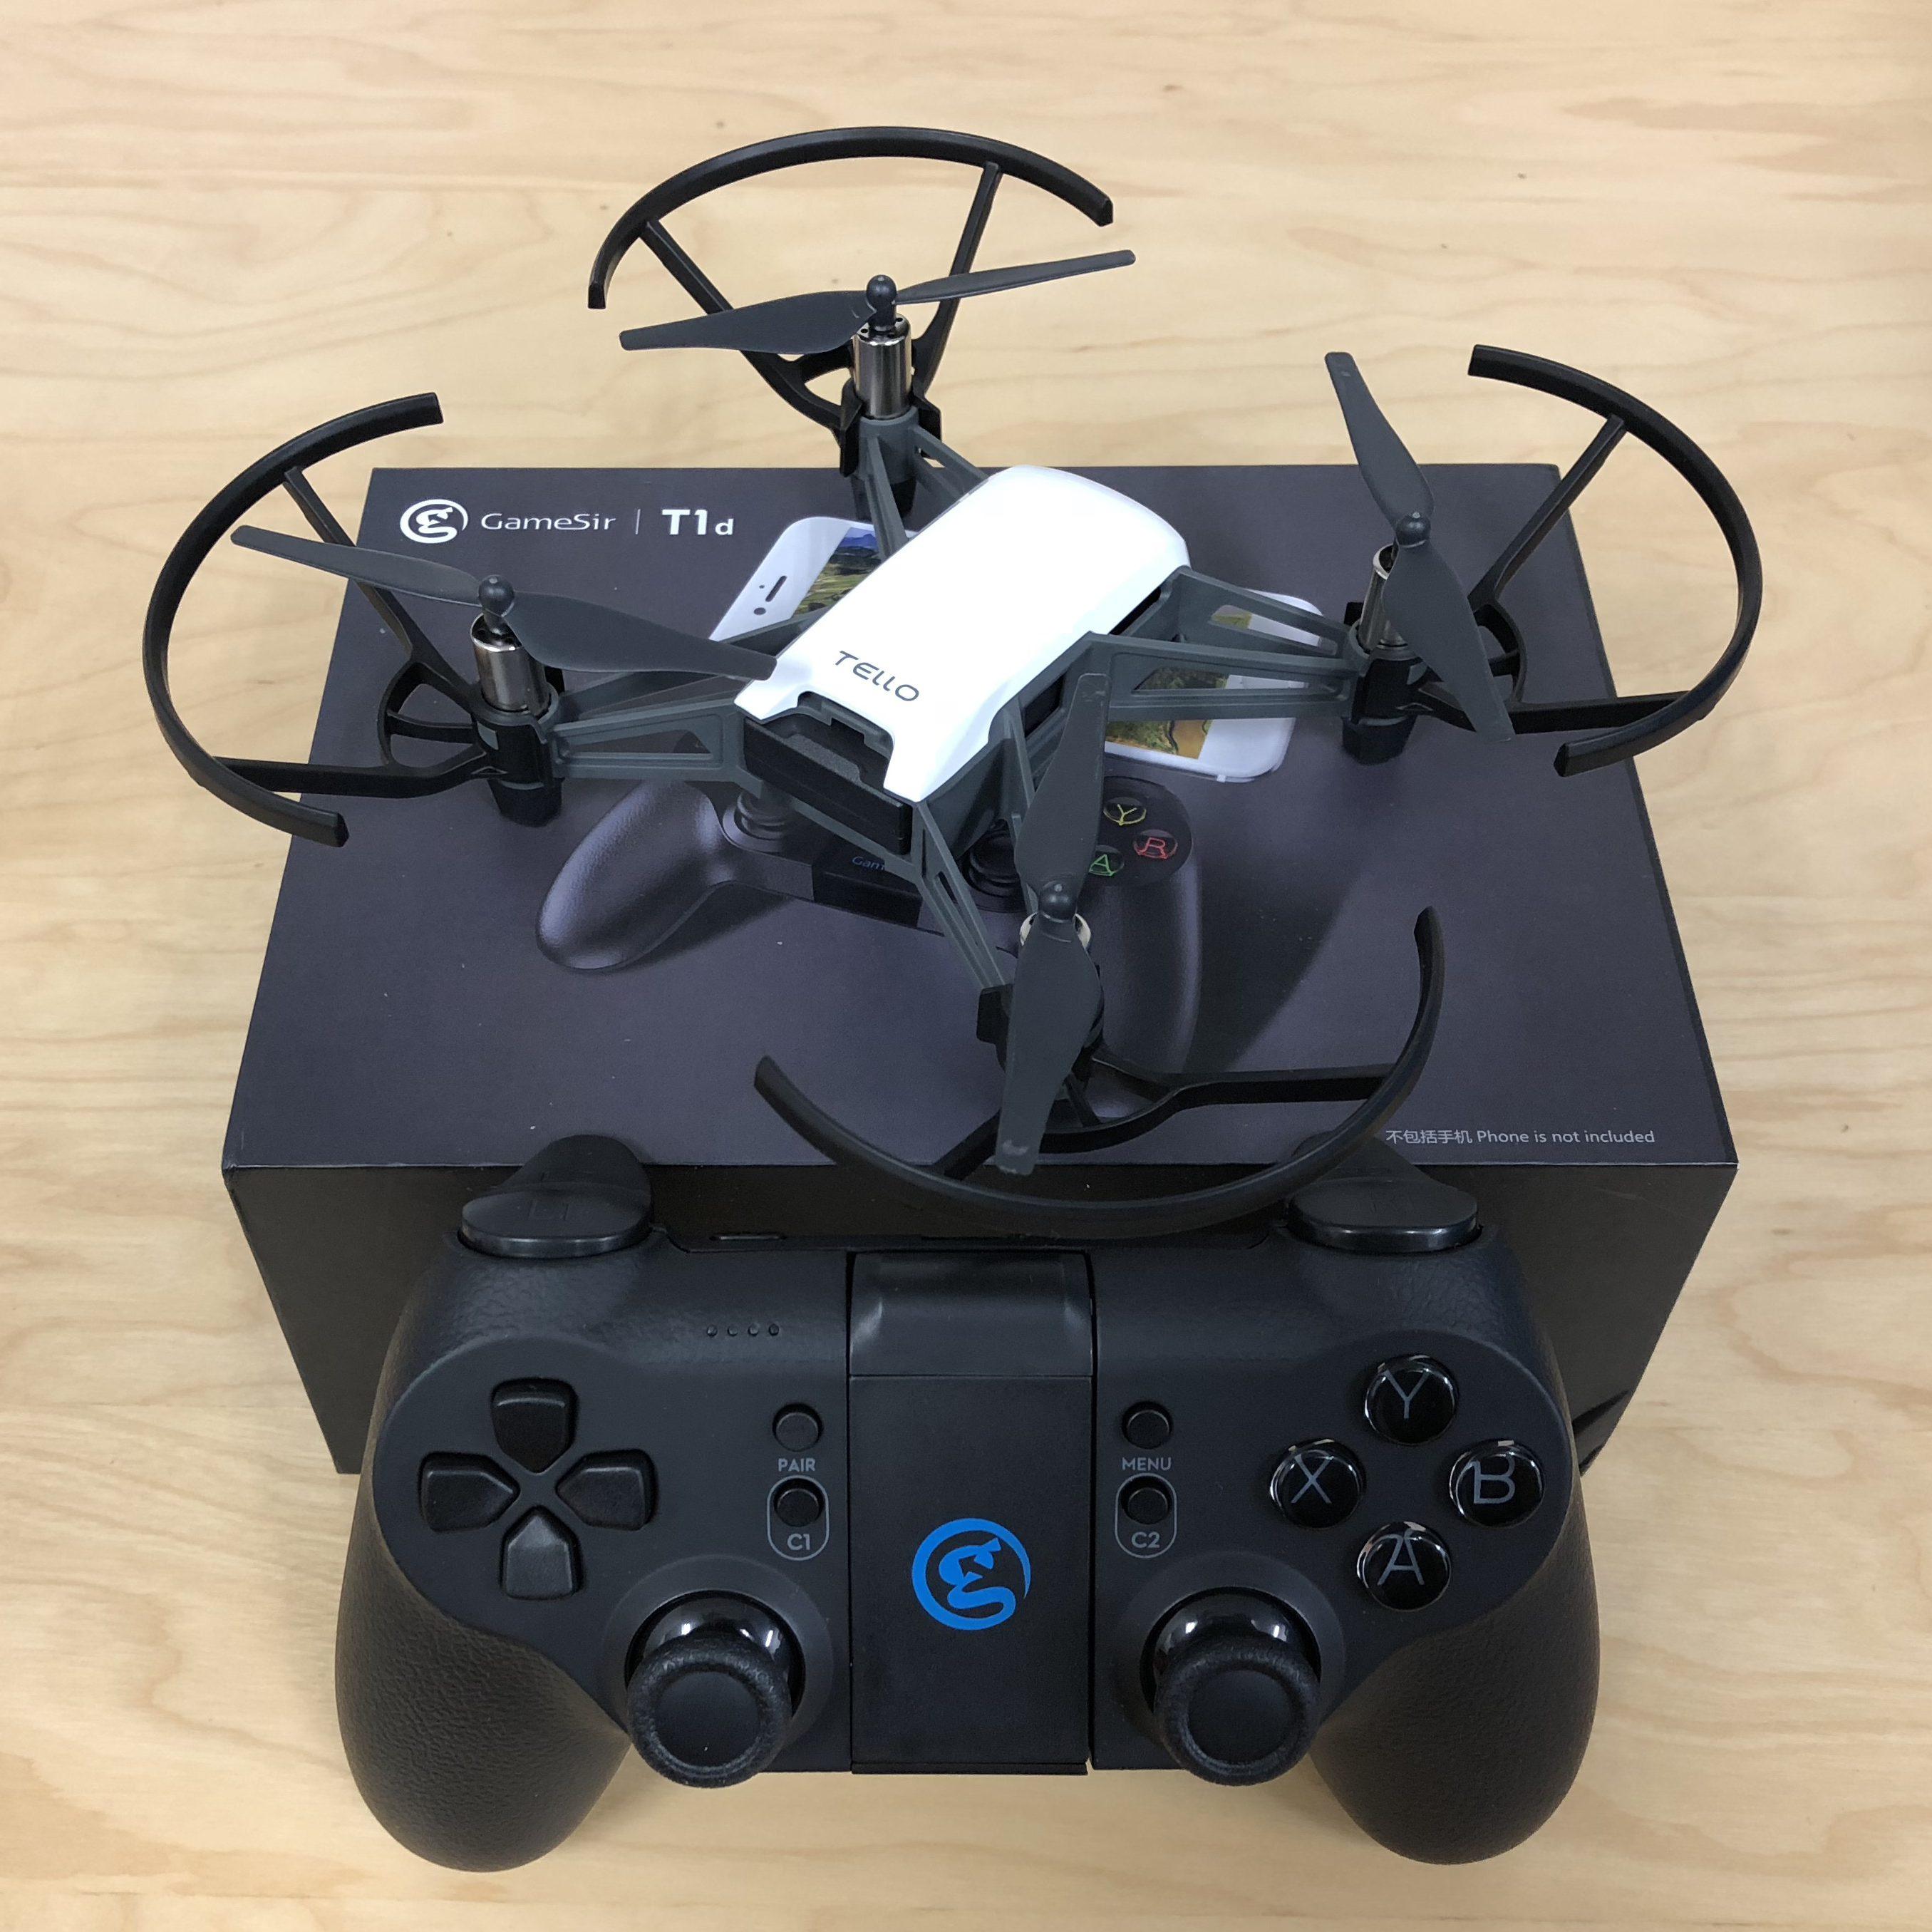 Tello+GameSirコントローラーの接続